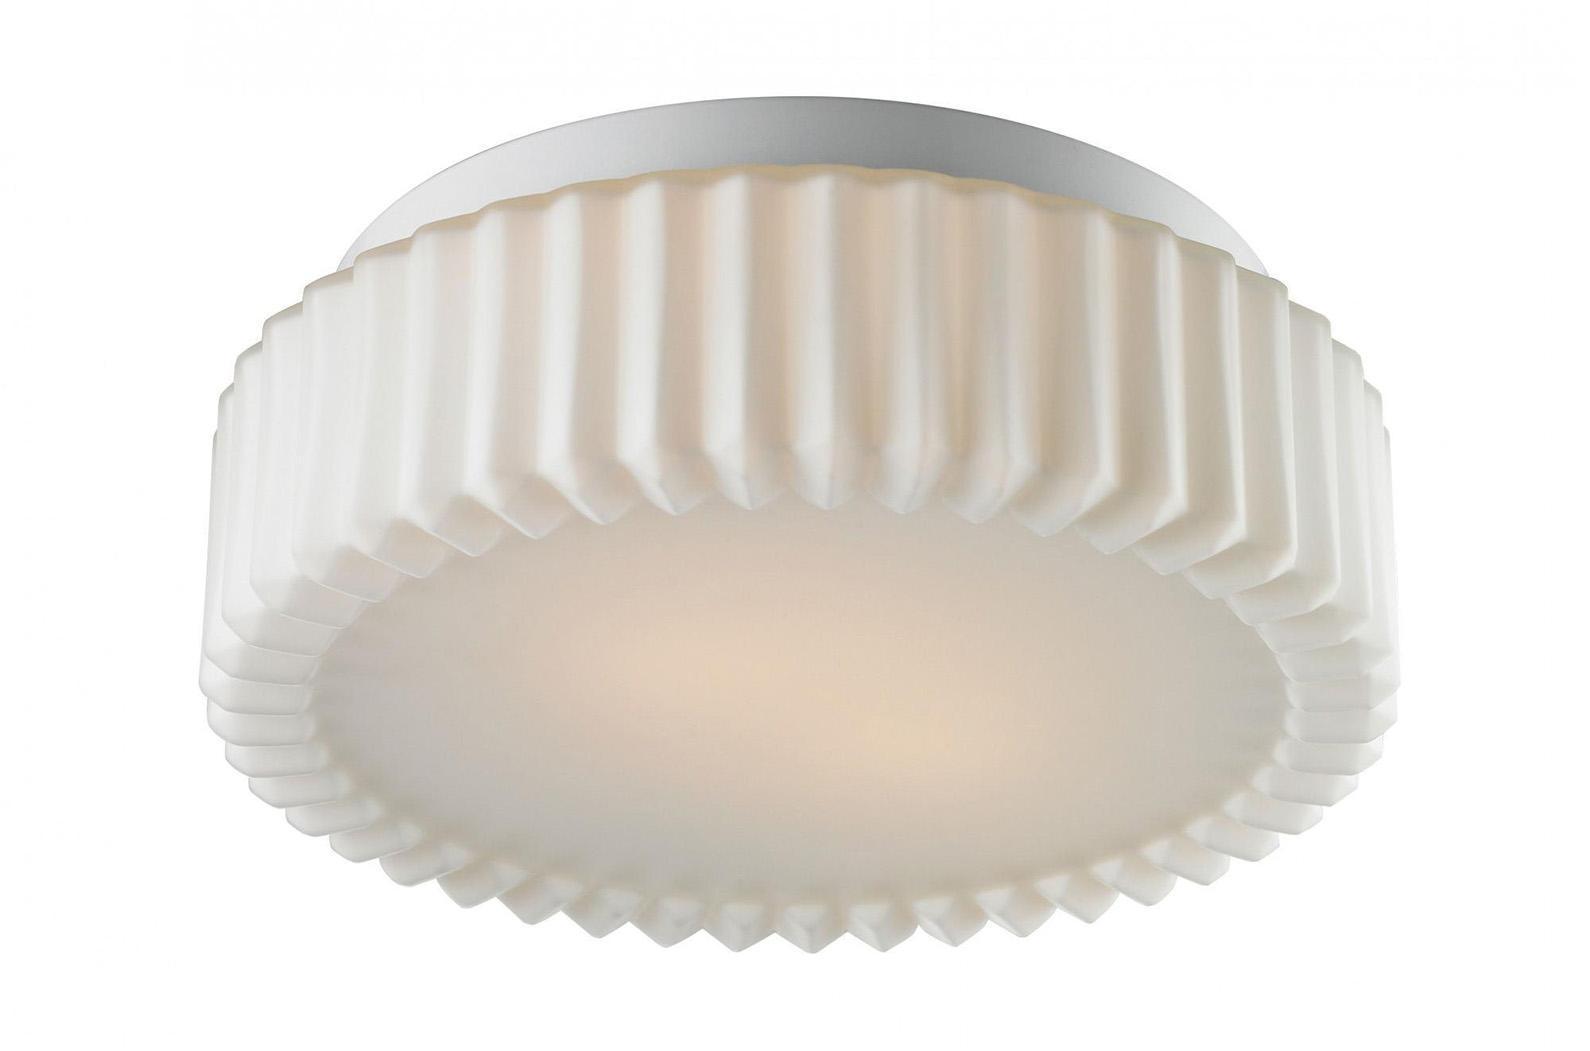 A5027PL-2WH AQUA Потолочный светильникA5027PL-2WHA5027PL-2WH AQUA Потолочный светильник 2xE27 60W Материал: Арматура: Металл / Плафон: Стекло Цвет: Арматура: Белый / Плафон: Белый Размер: 11x30x30